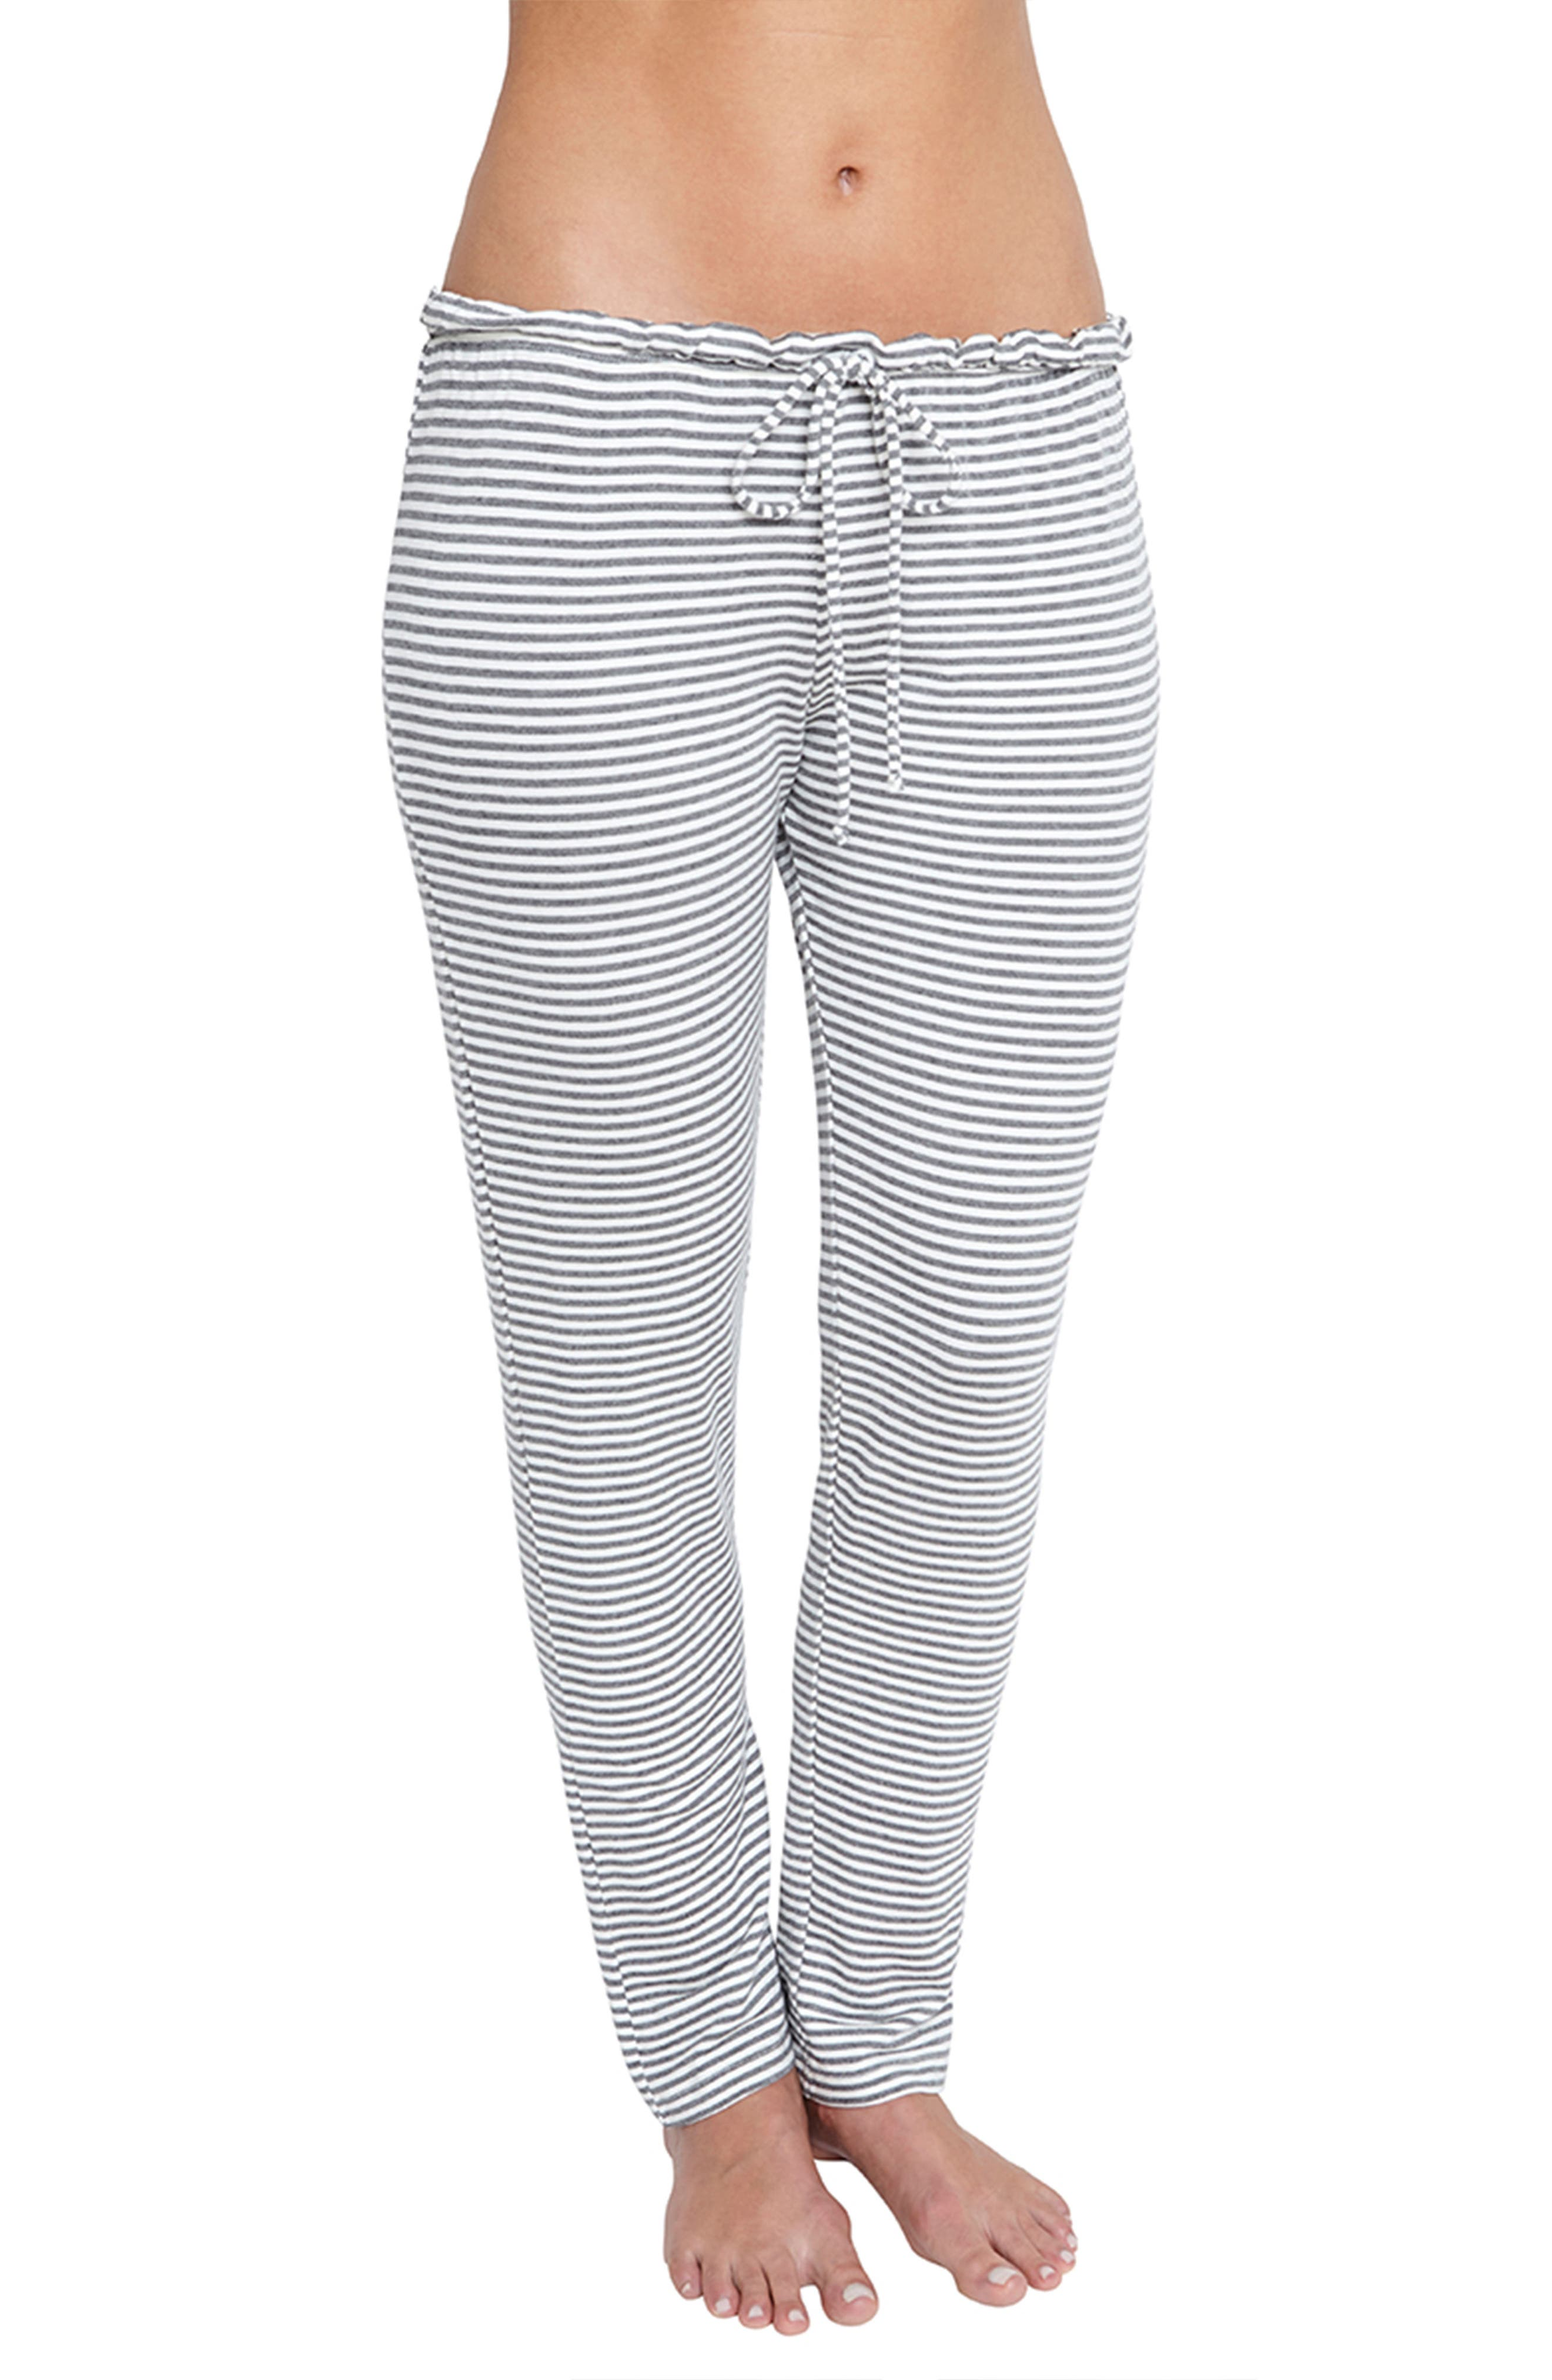 Sadie Stripes Pajama Pants,                             Main thumbnail 1, color,